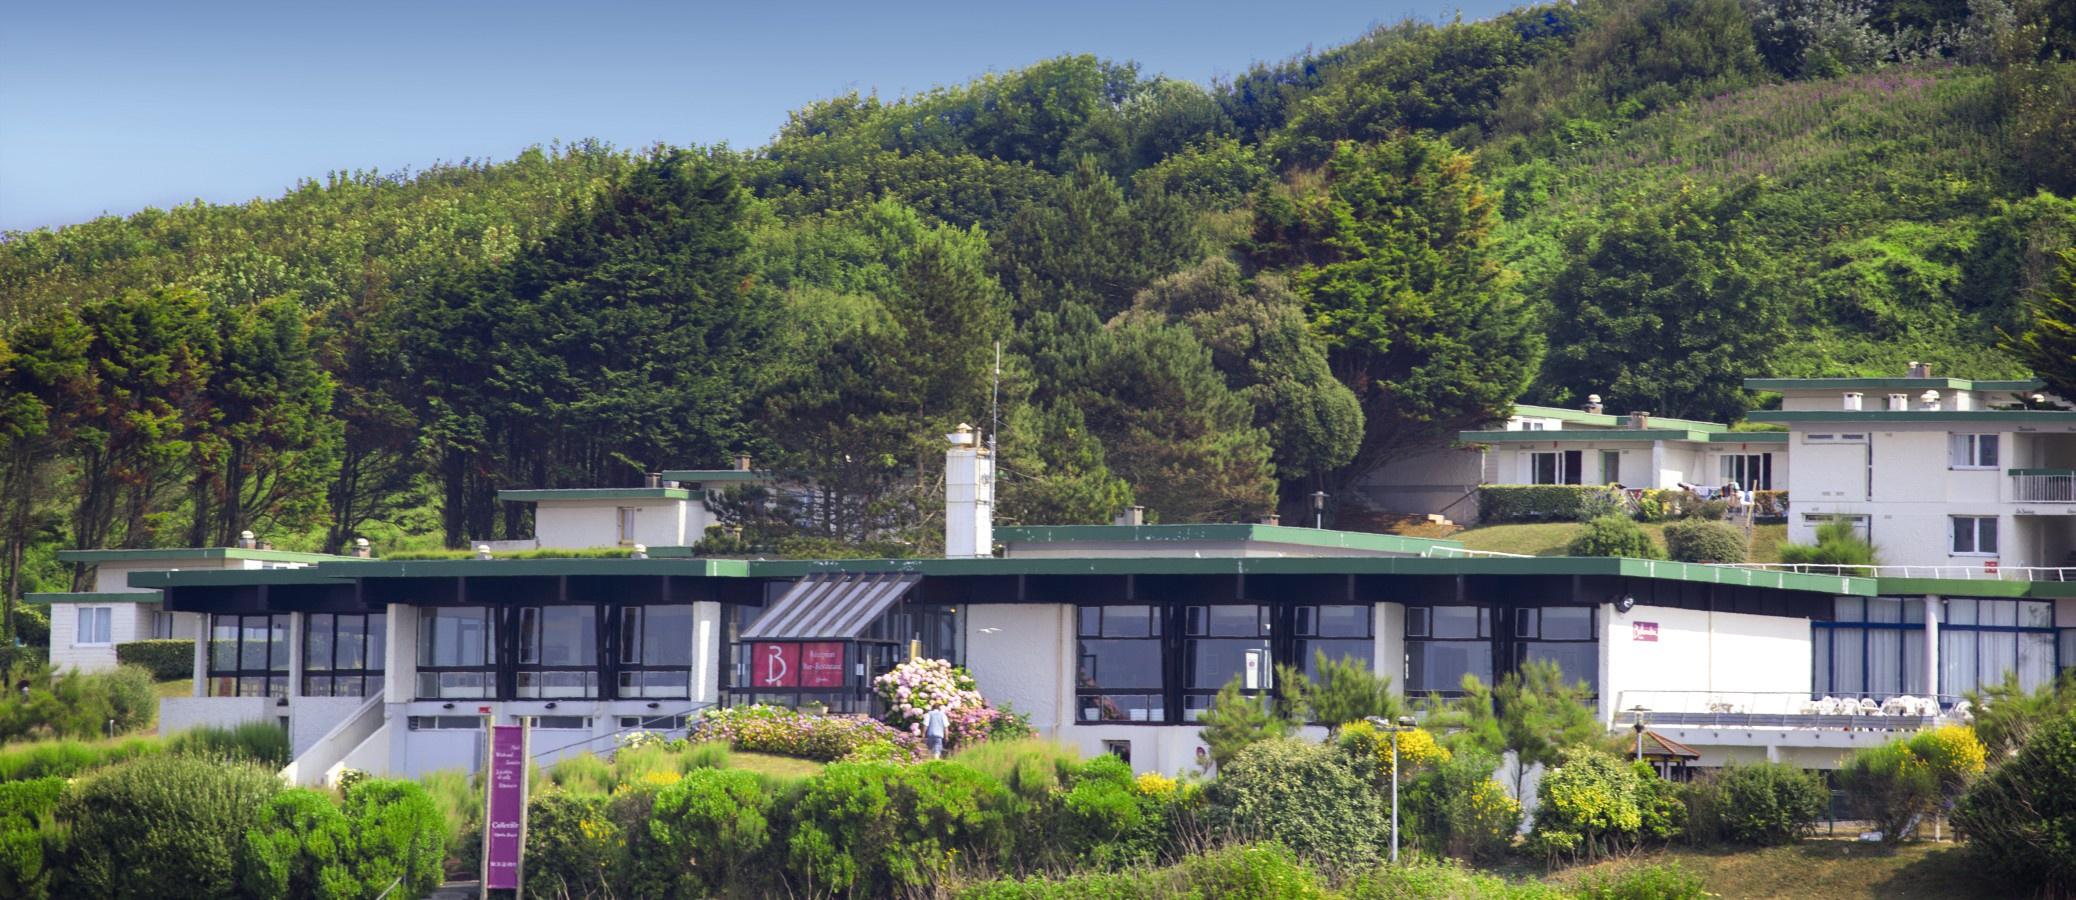 Photo n° 1 Colleville- sur- Mer - Belambra clubs